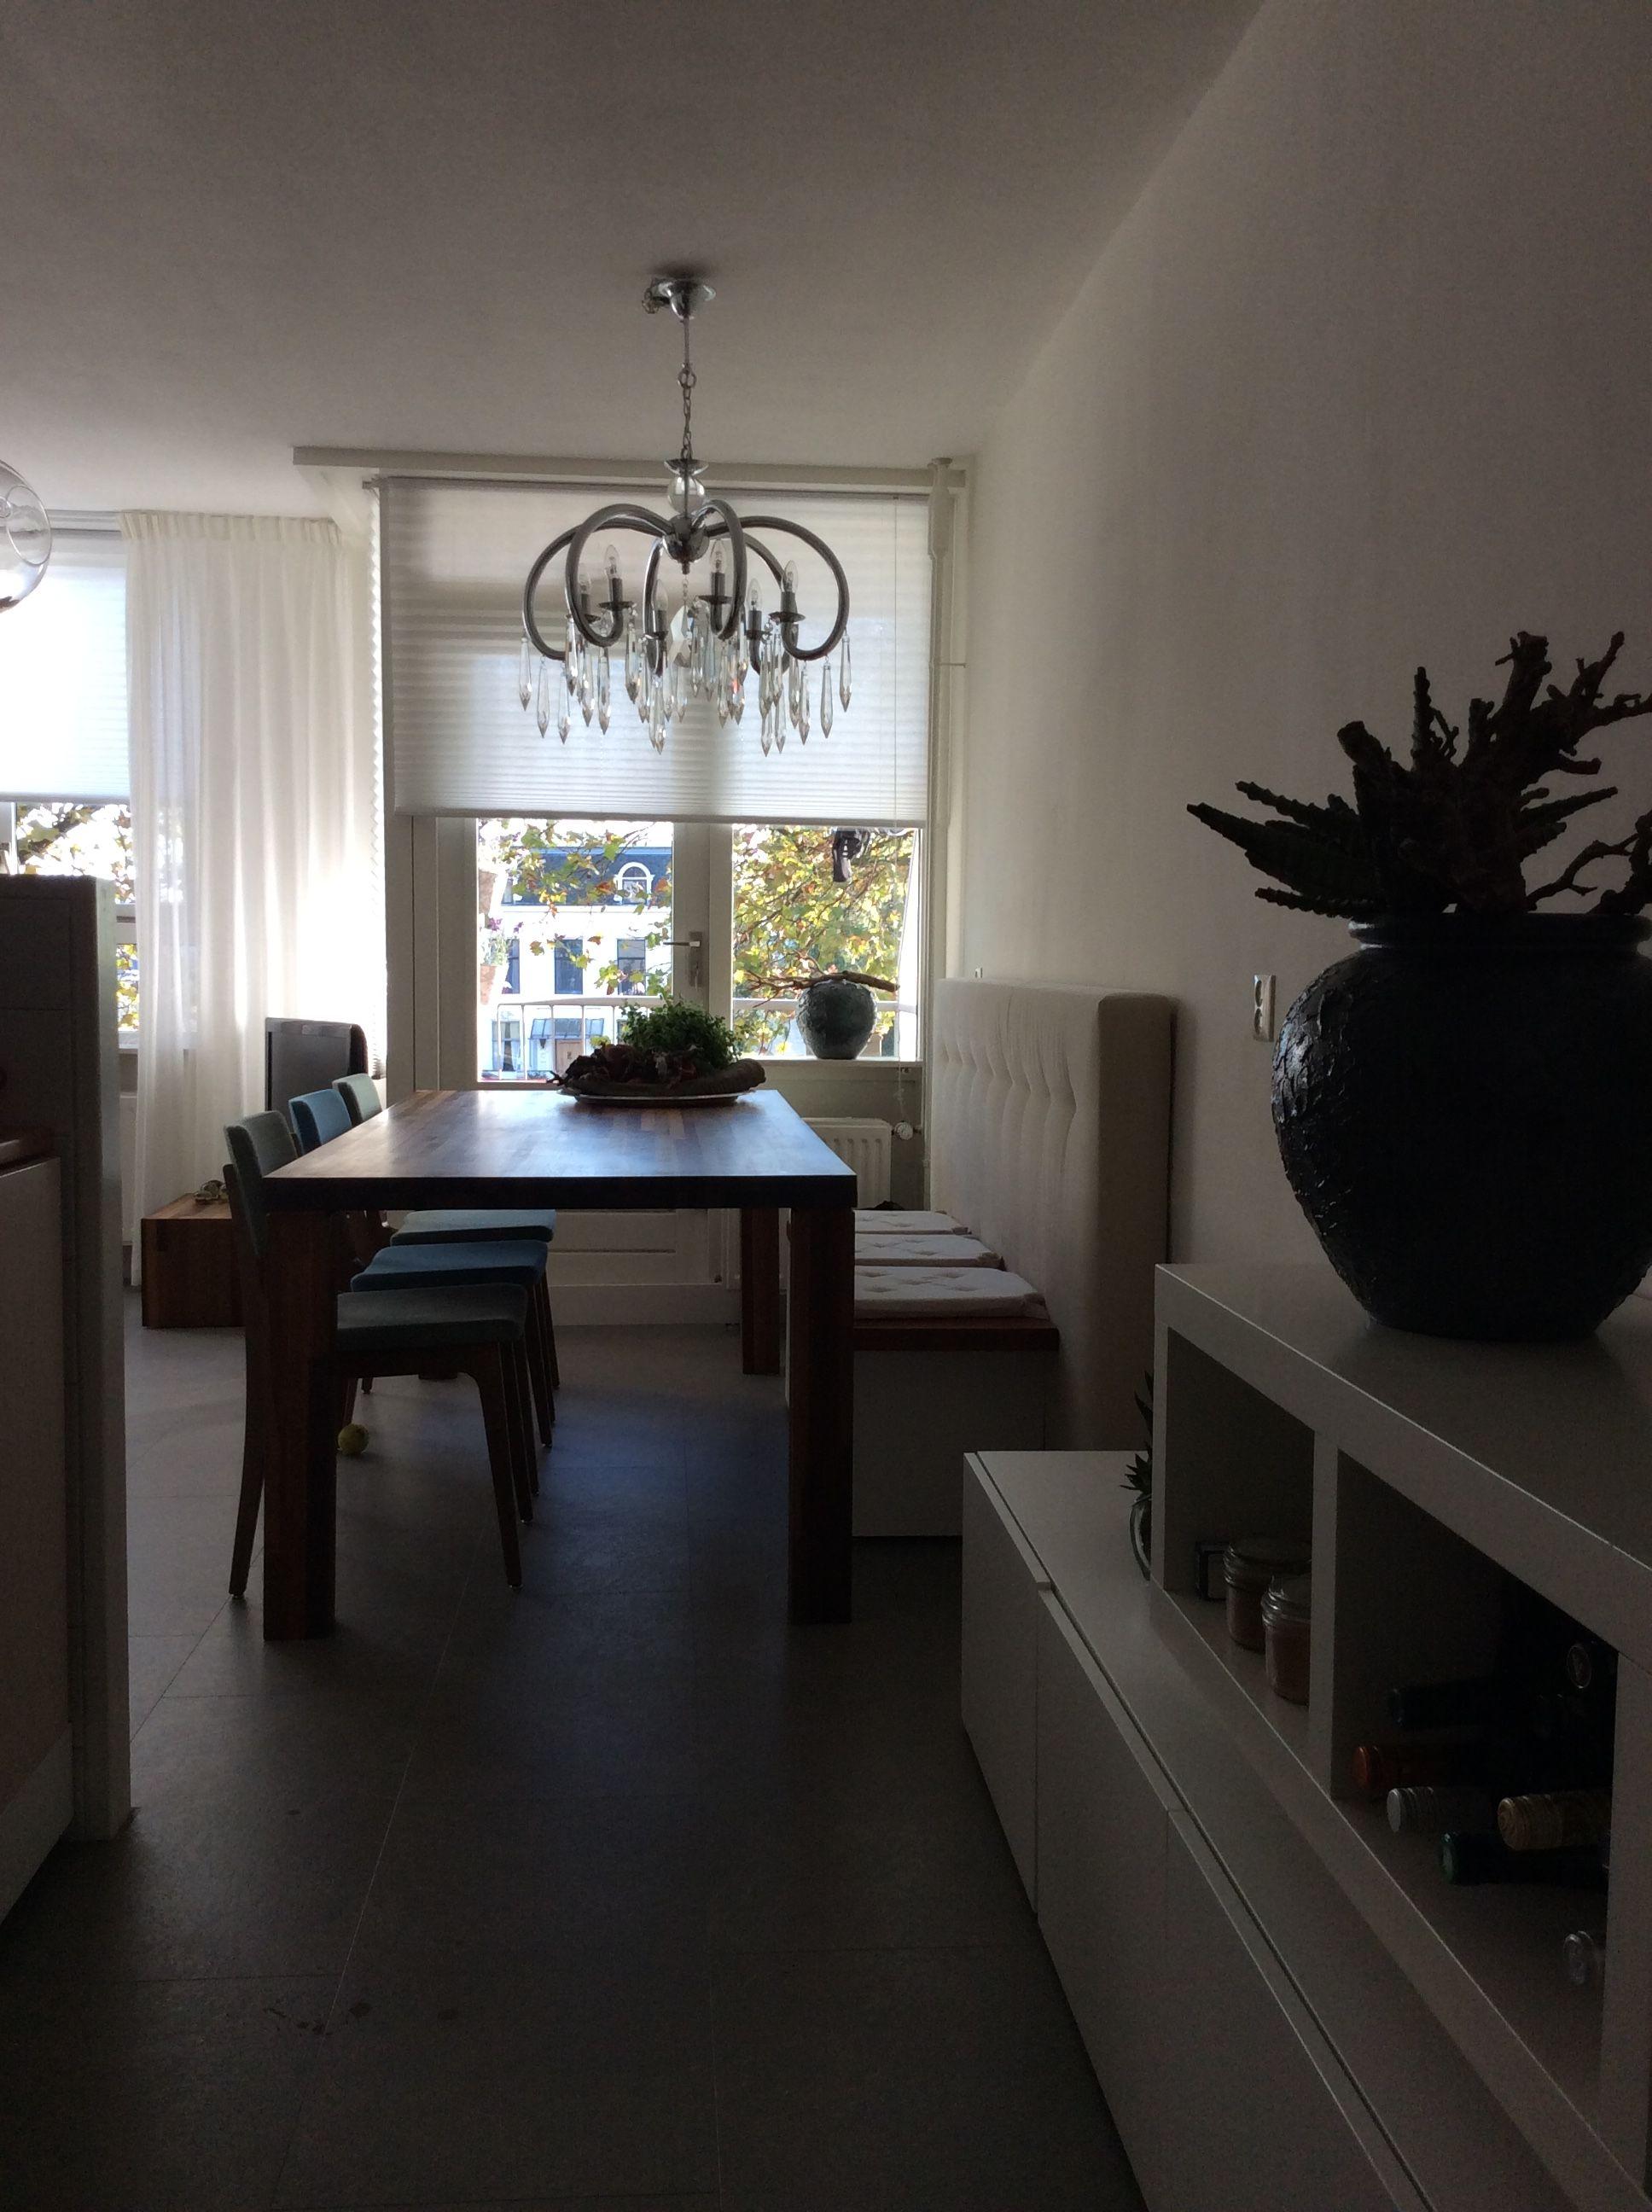 Kleine woonkamer met grote eettafel | Jo | Pinterest